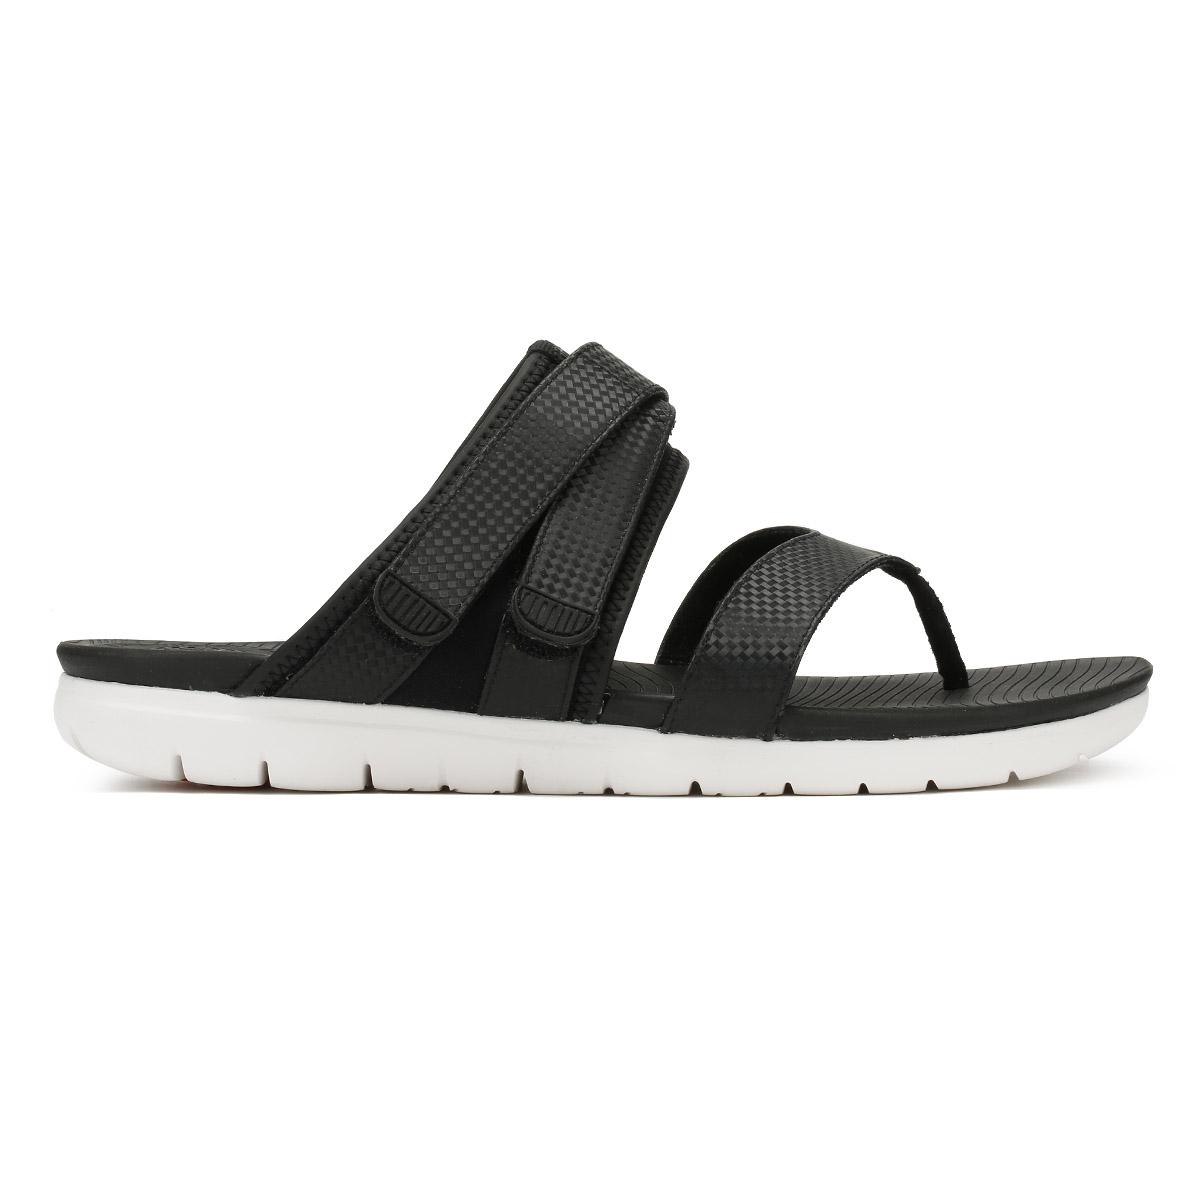 c94e3ca074b28 FitFlop Neoflex Toe Thong - Black Mix (man-made) Womens Sandals 4 UK ...